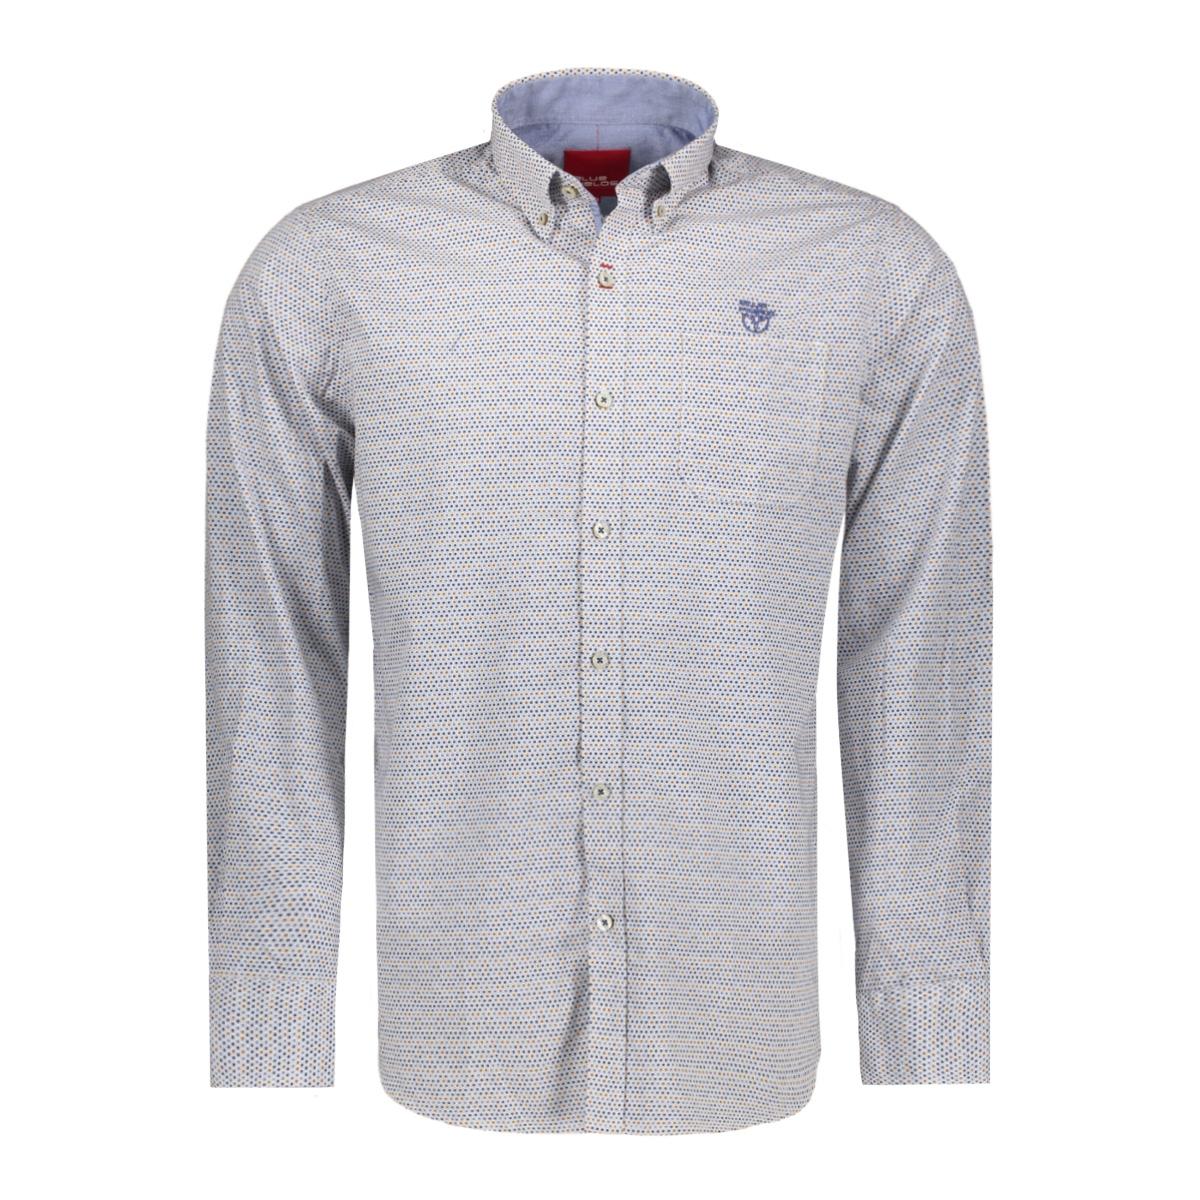 214-37001 bluefields overhemd 8457